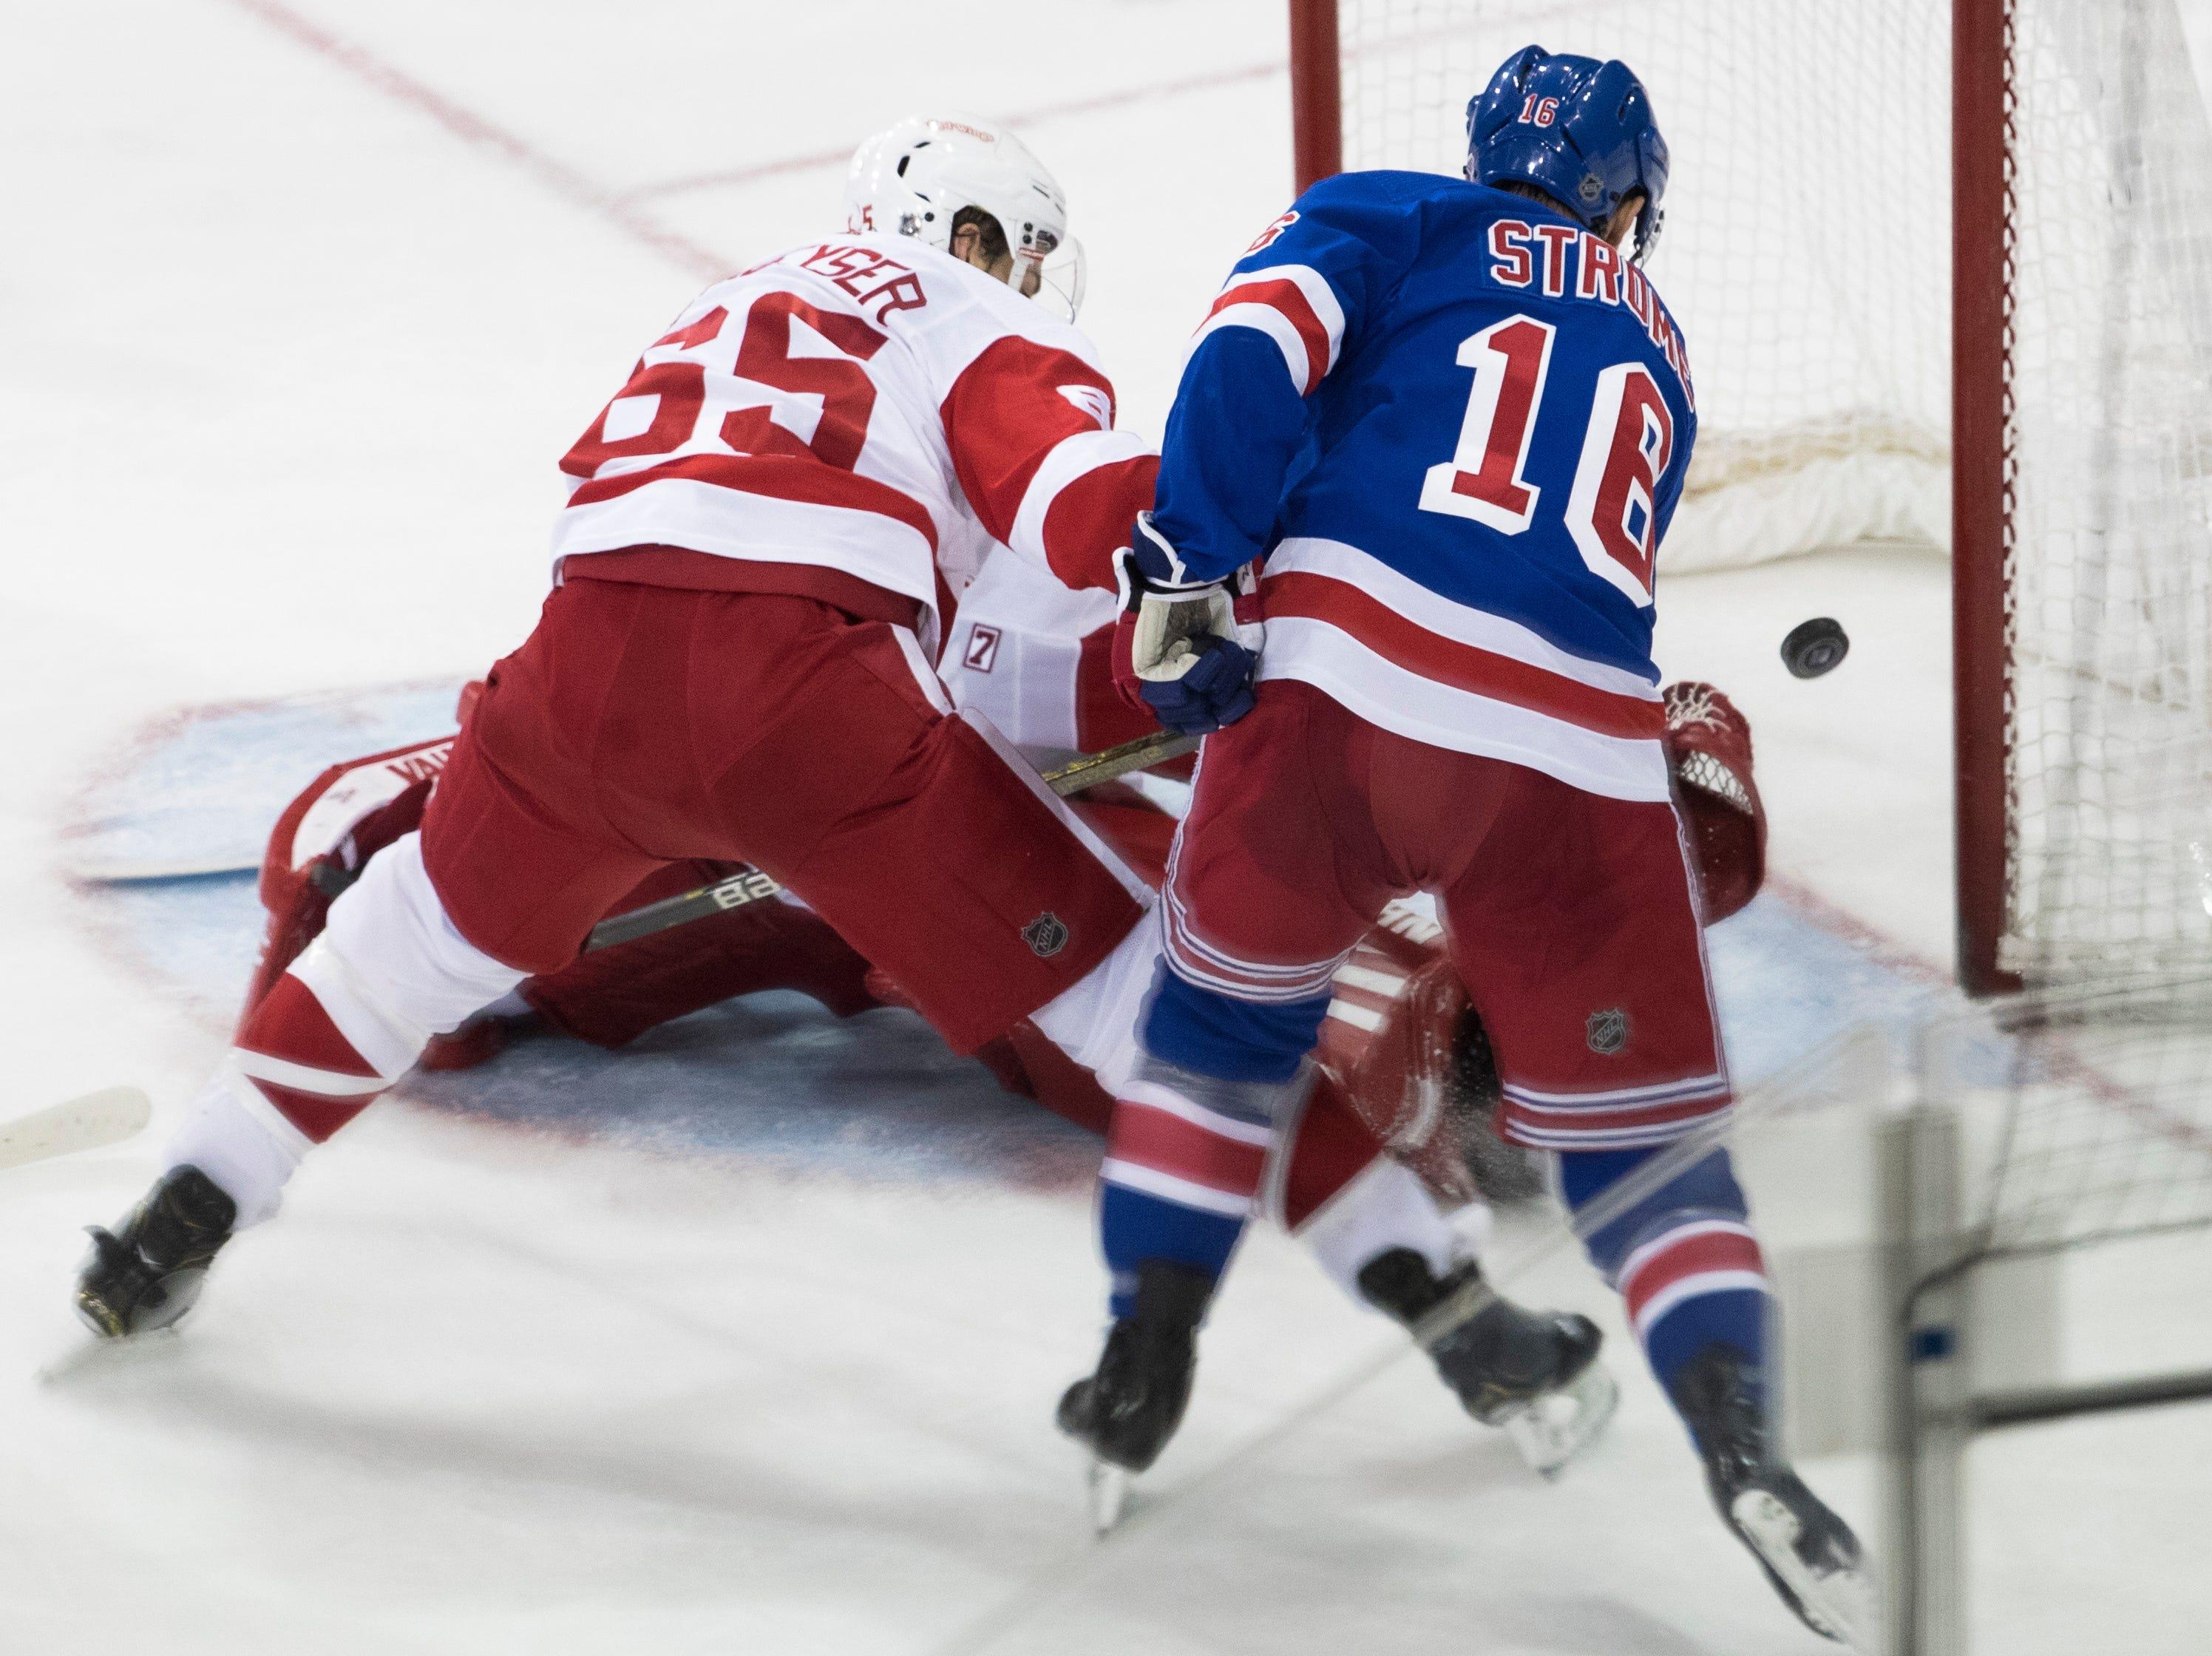 New York Rangers center Ryan Strome (16) scores a goal past Detroit Red Wings defenseman Danny DeKeyser (65) and goaltender Jimmy Howard during the third period.